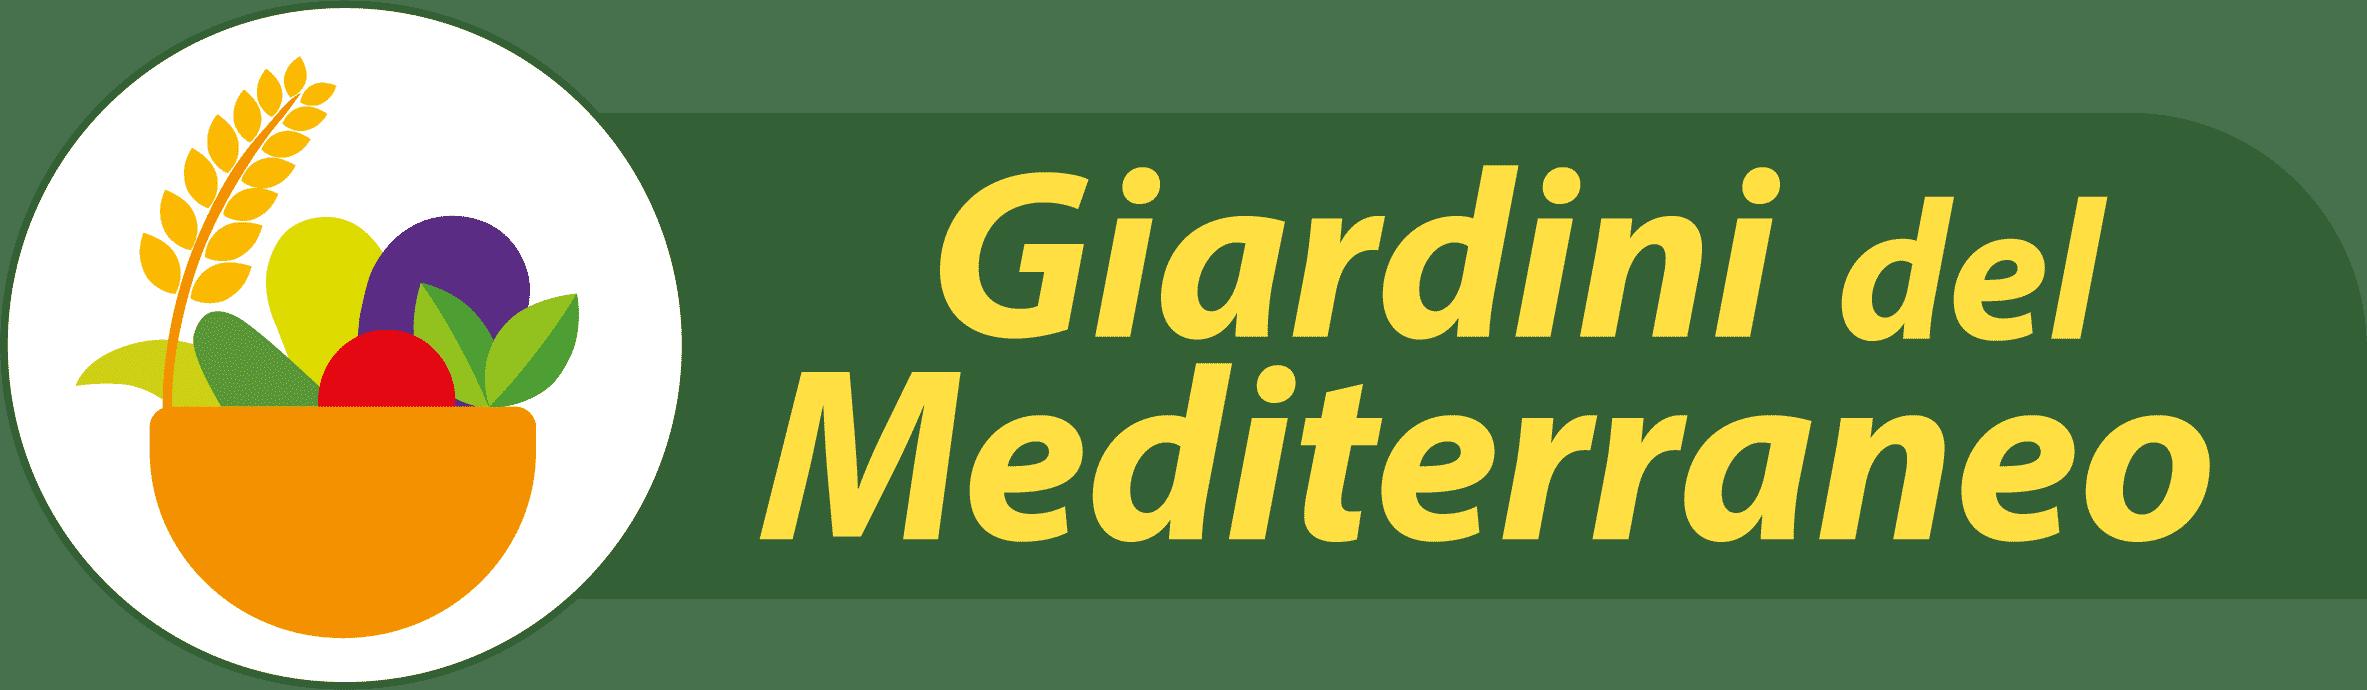 Giardini del Mediterraneo Srl